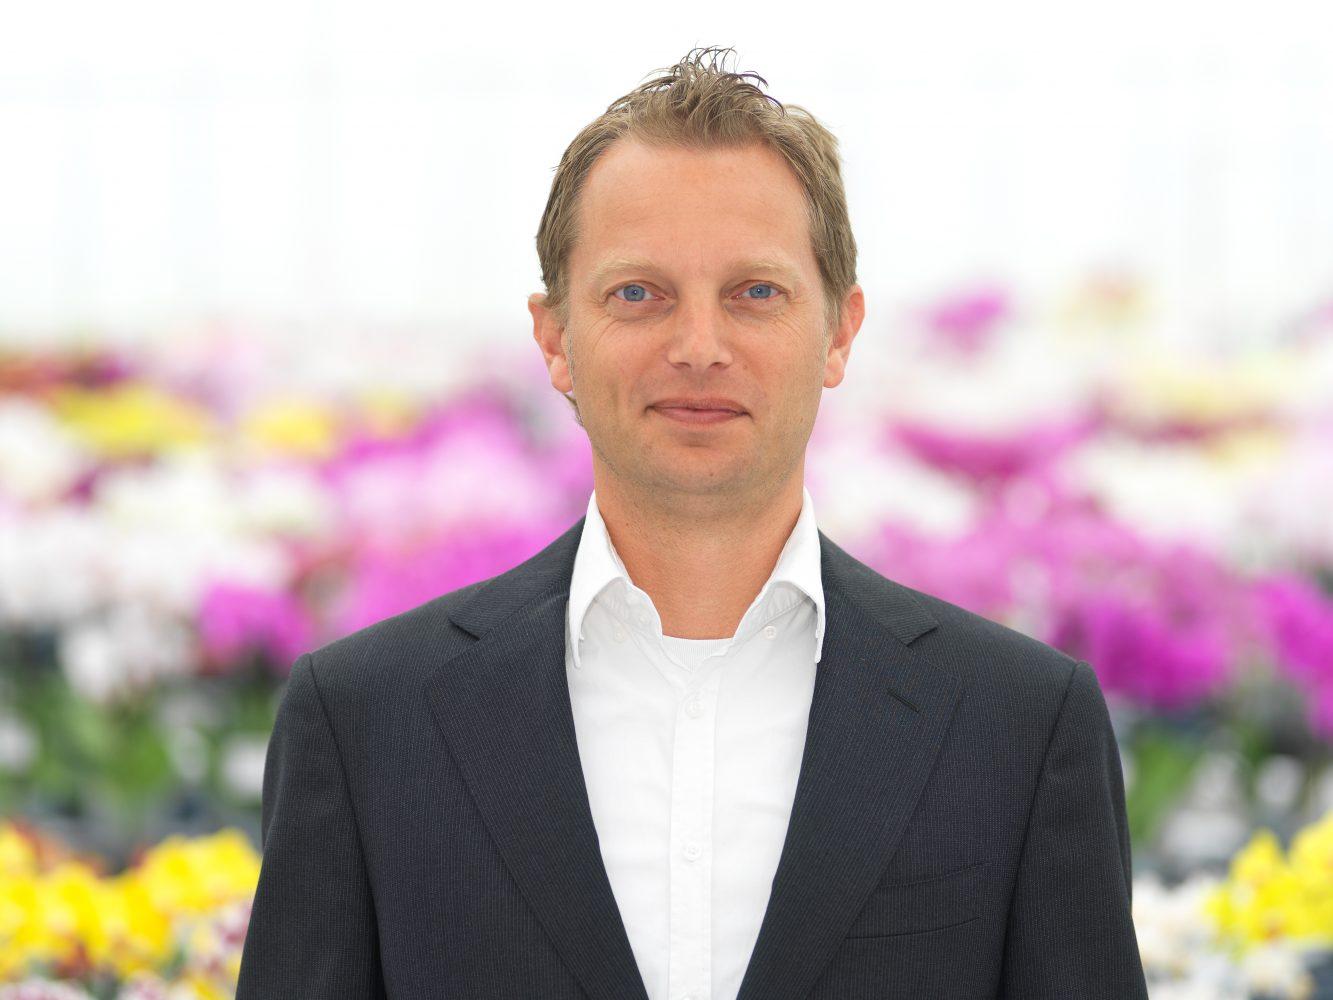 Joost Hendriks, Accountmanager Orchideeën